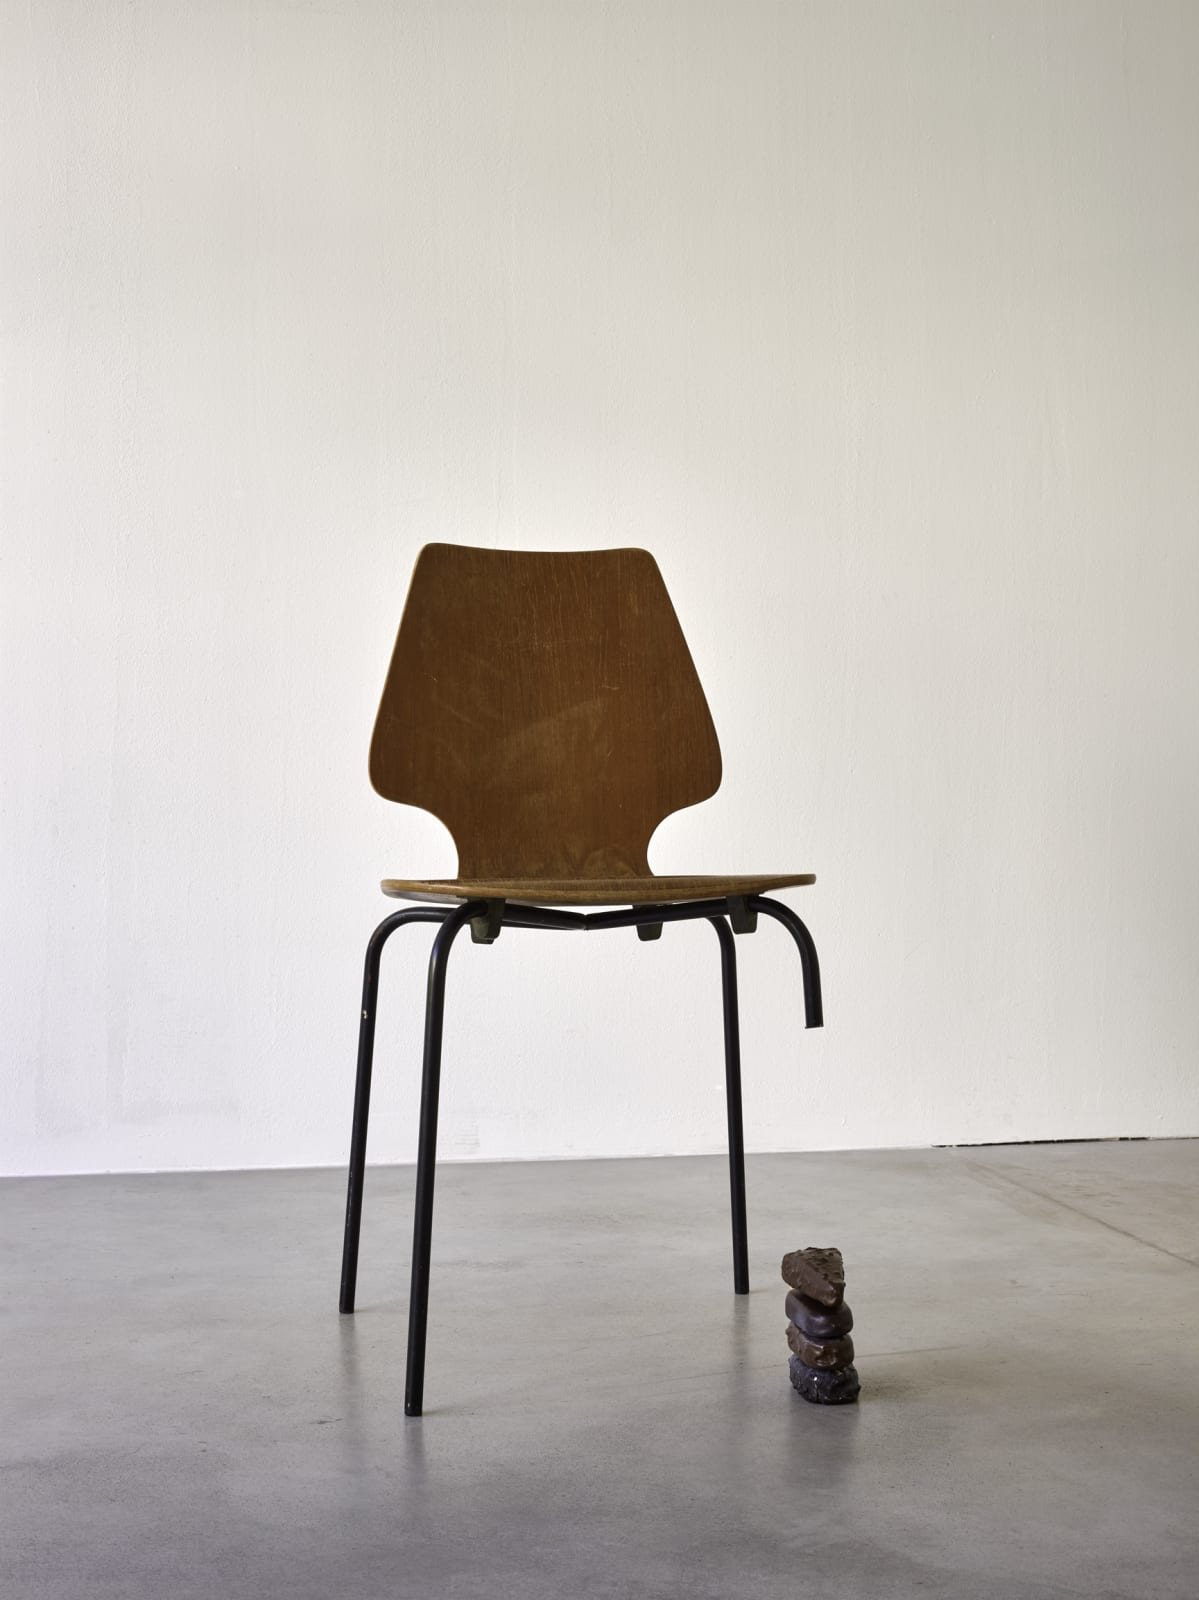 He Xiangyu 4 Ice Creams Plywood, metal, glass-fiber reinforced plastic, acrylic Chair: 82 x 42 x 42 in (208.3 x 106.7 x 106.7 cm); Ice creams: 12 x 6 x 15 in (30.5 x 15.2 x 38.1 cm)